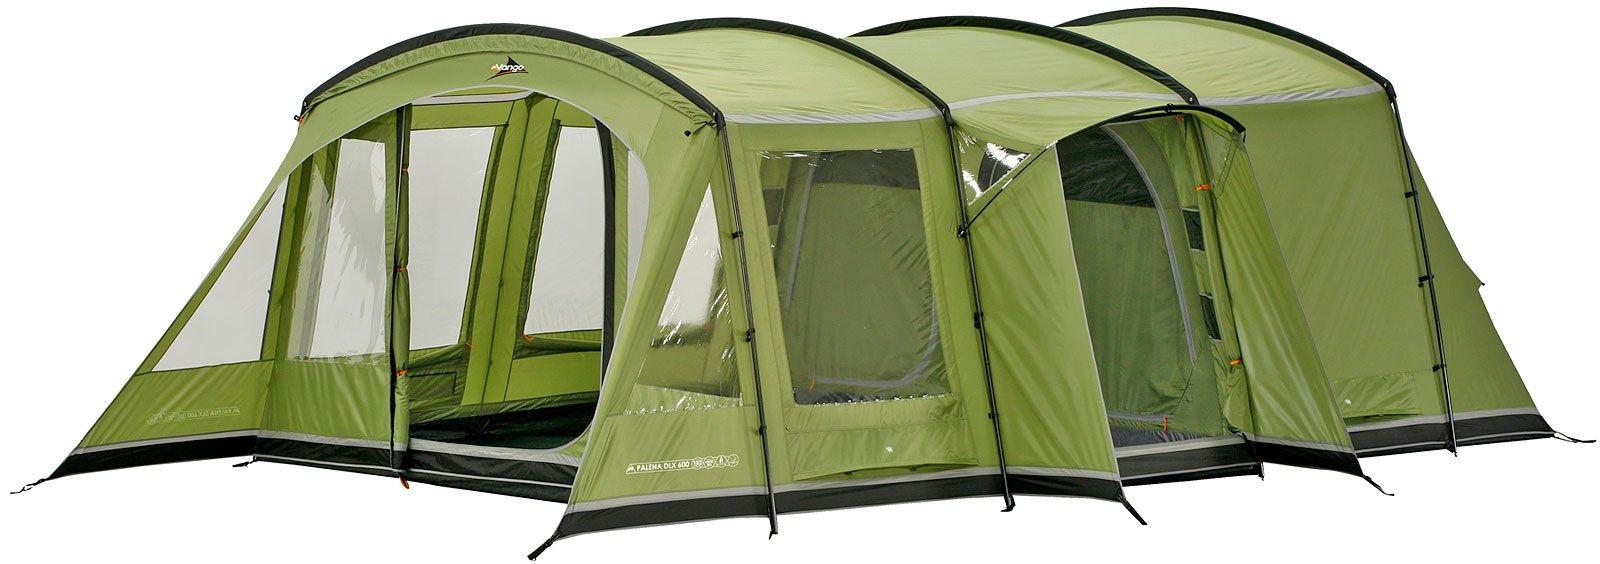 Awesome Vango Palena Dlx 600 Family Tent Go Outdoors Lake Etc Machost Co Dining Chair Design Ideas Machostcouk